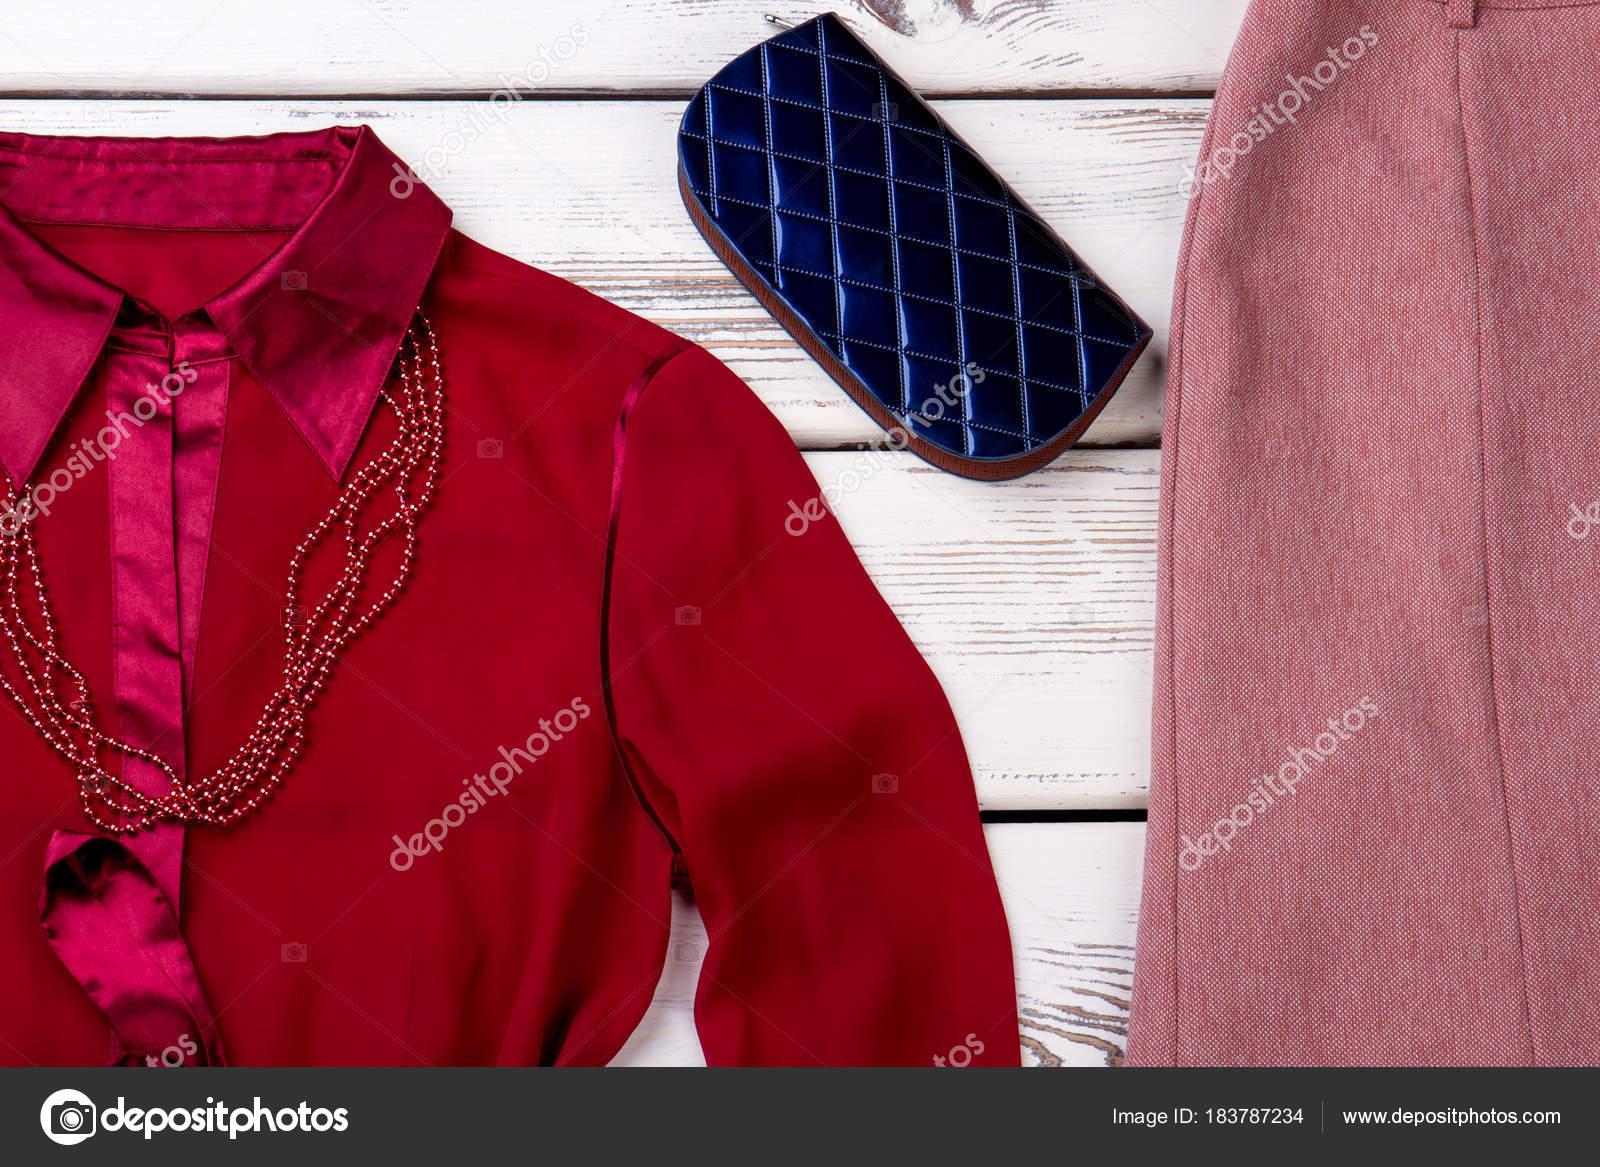 0fd5a6d4707 Κομψά γυναικεία ρούχα και αξεσουάρ. — Φωτογραφία Αρχείου © Denisfilm ...